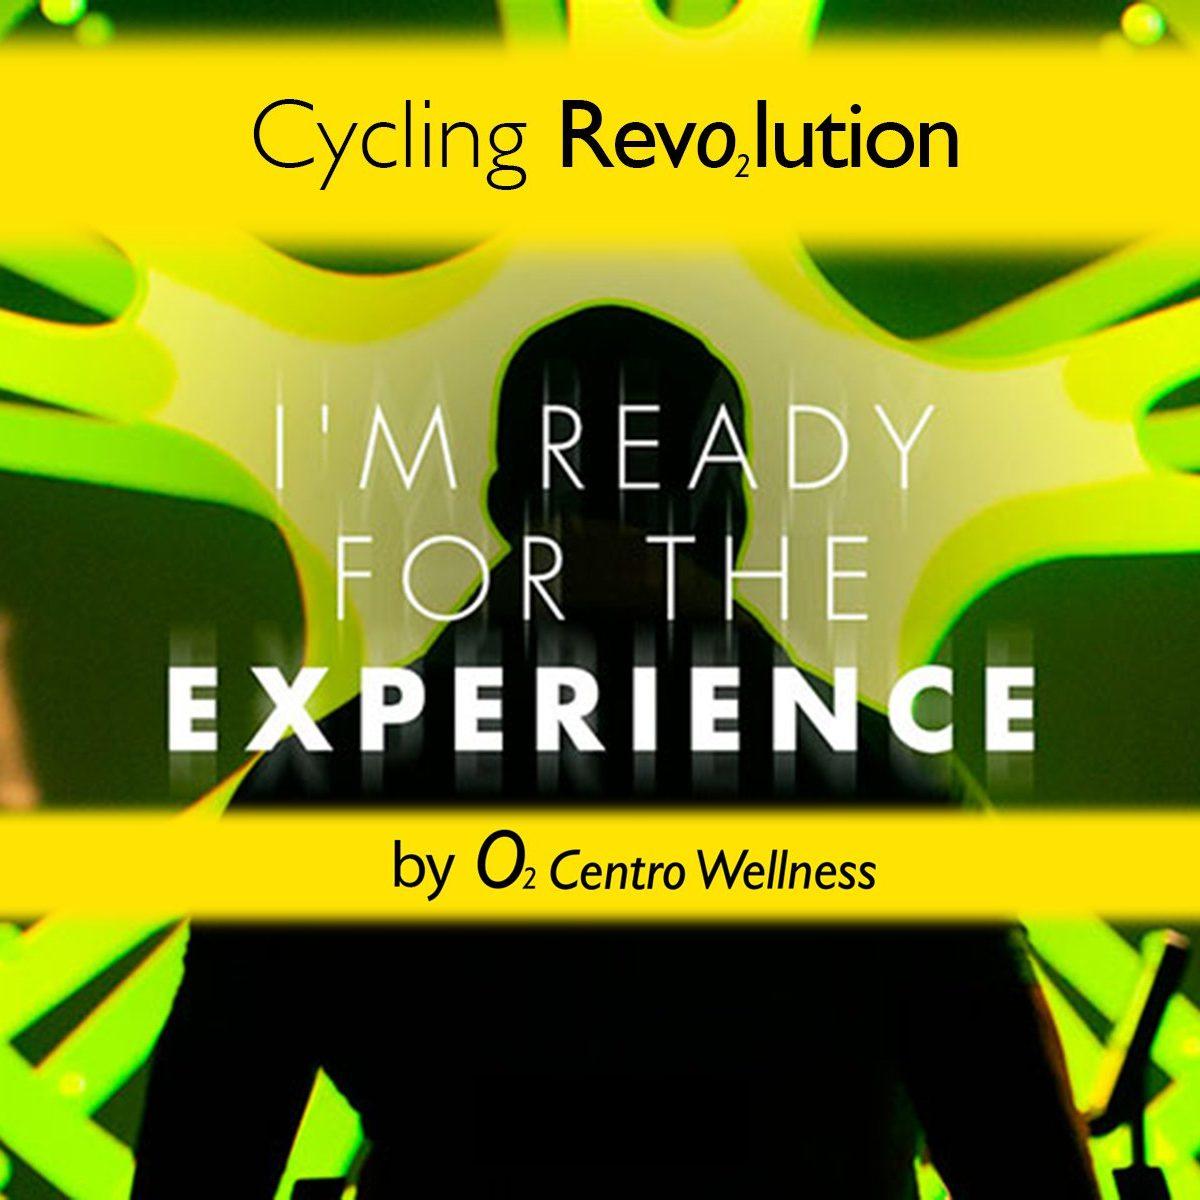 Wellness Revolution Gimnasio Madrid